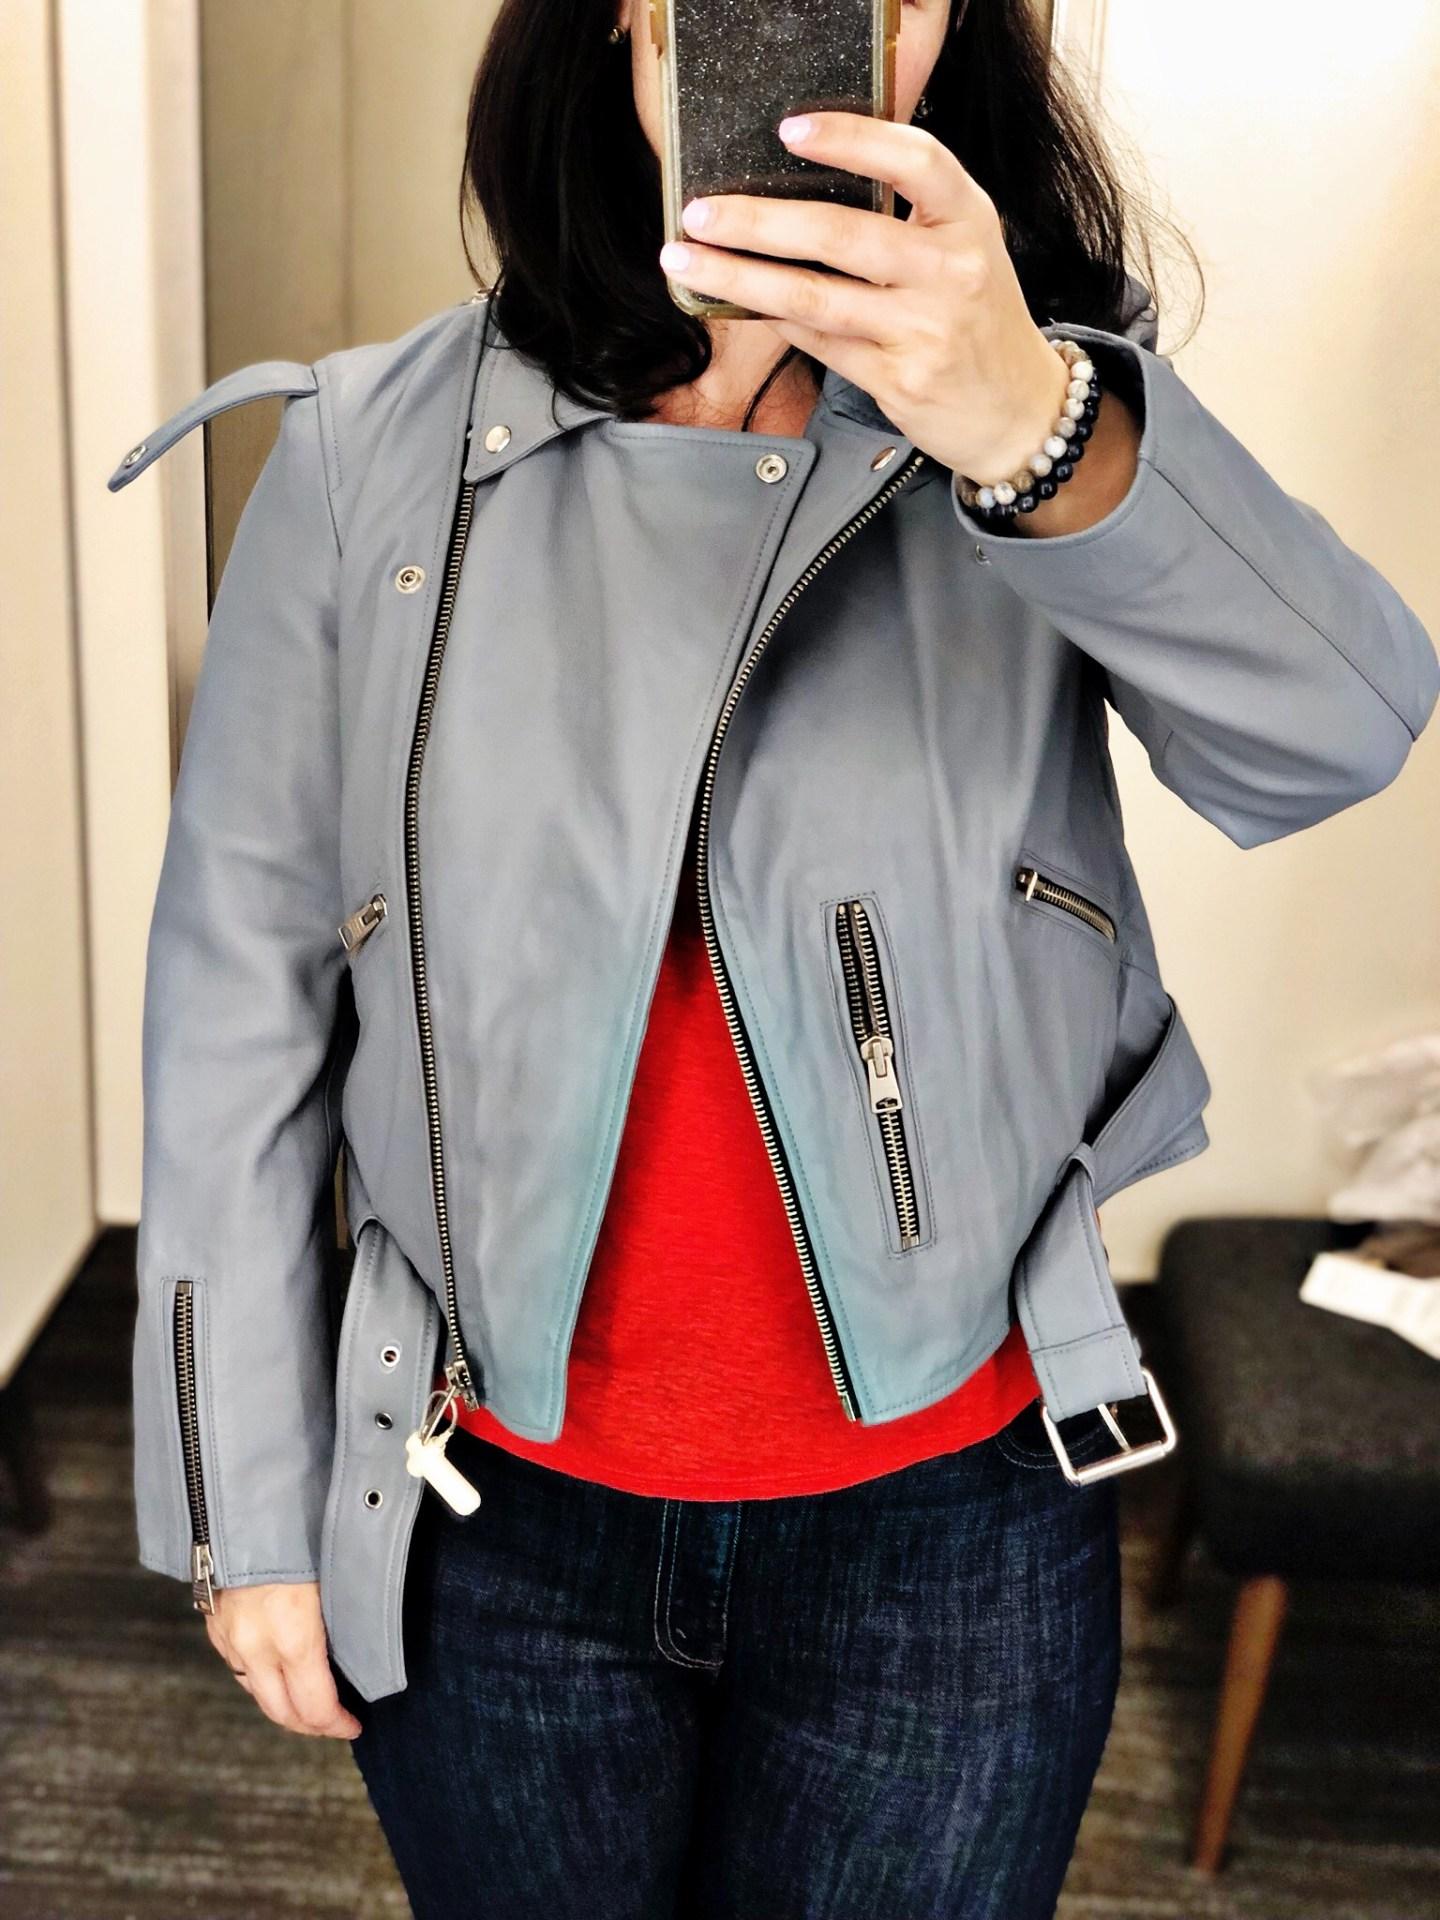 ALLSAINTS Balfern Jacket | Nordstrom Anniversary Sale 2019